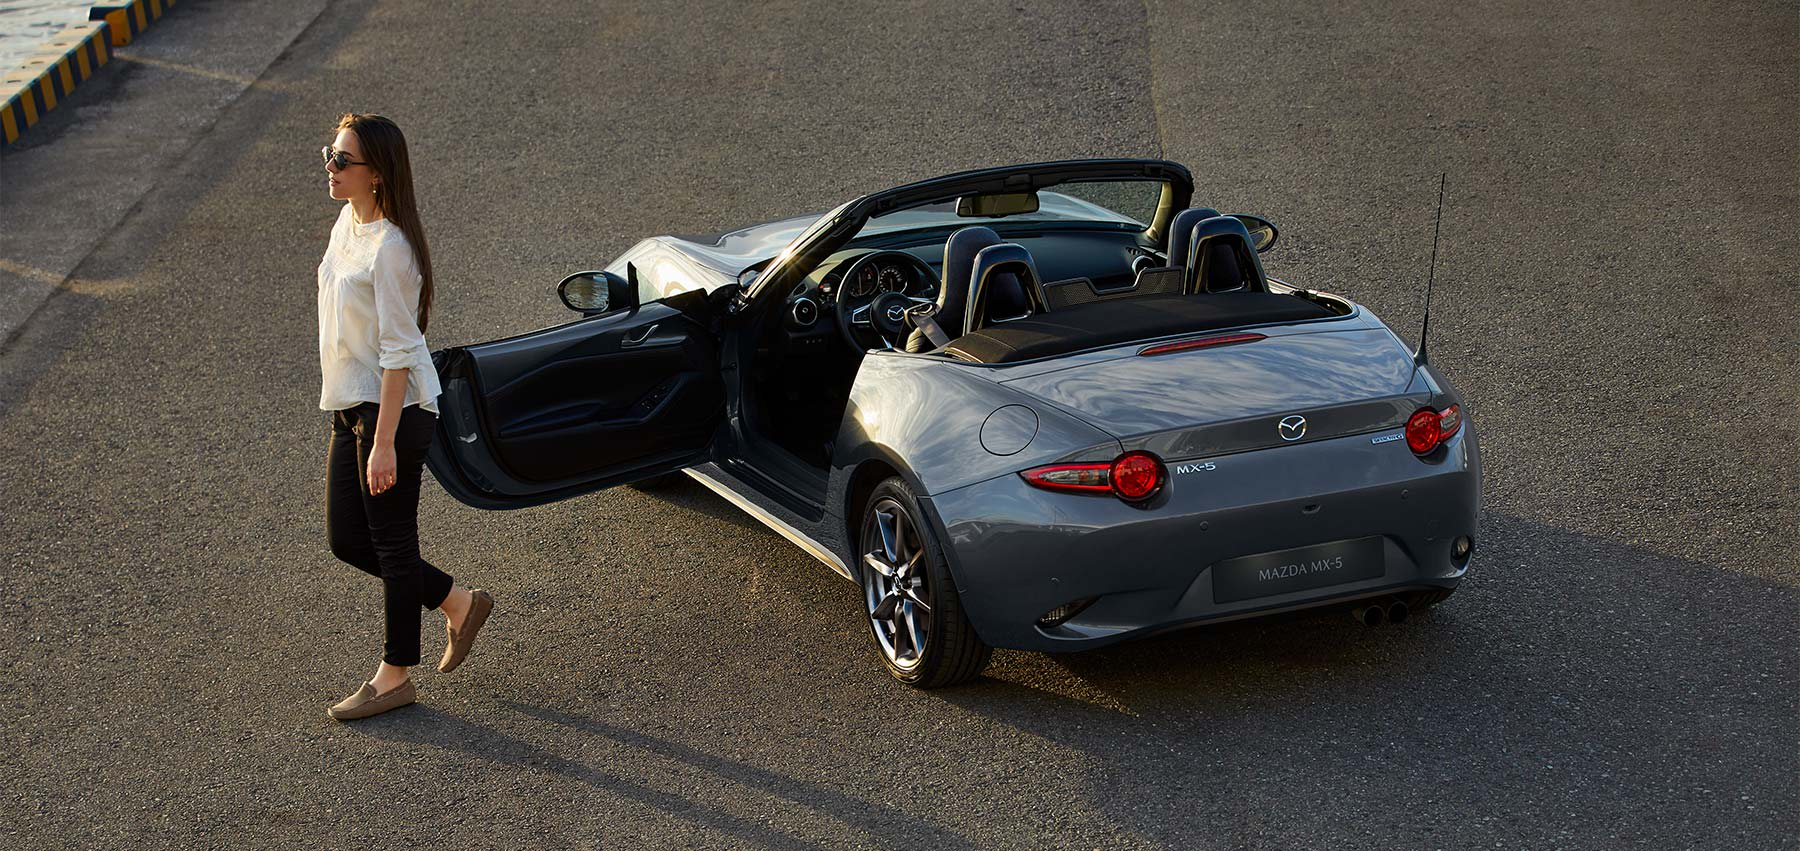 2020 Mazda MX-5 Concept